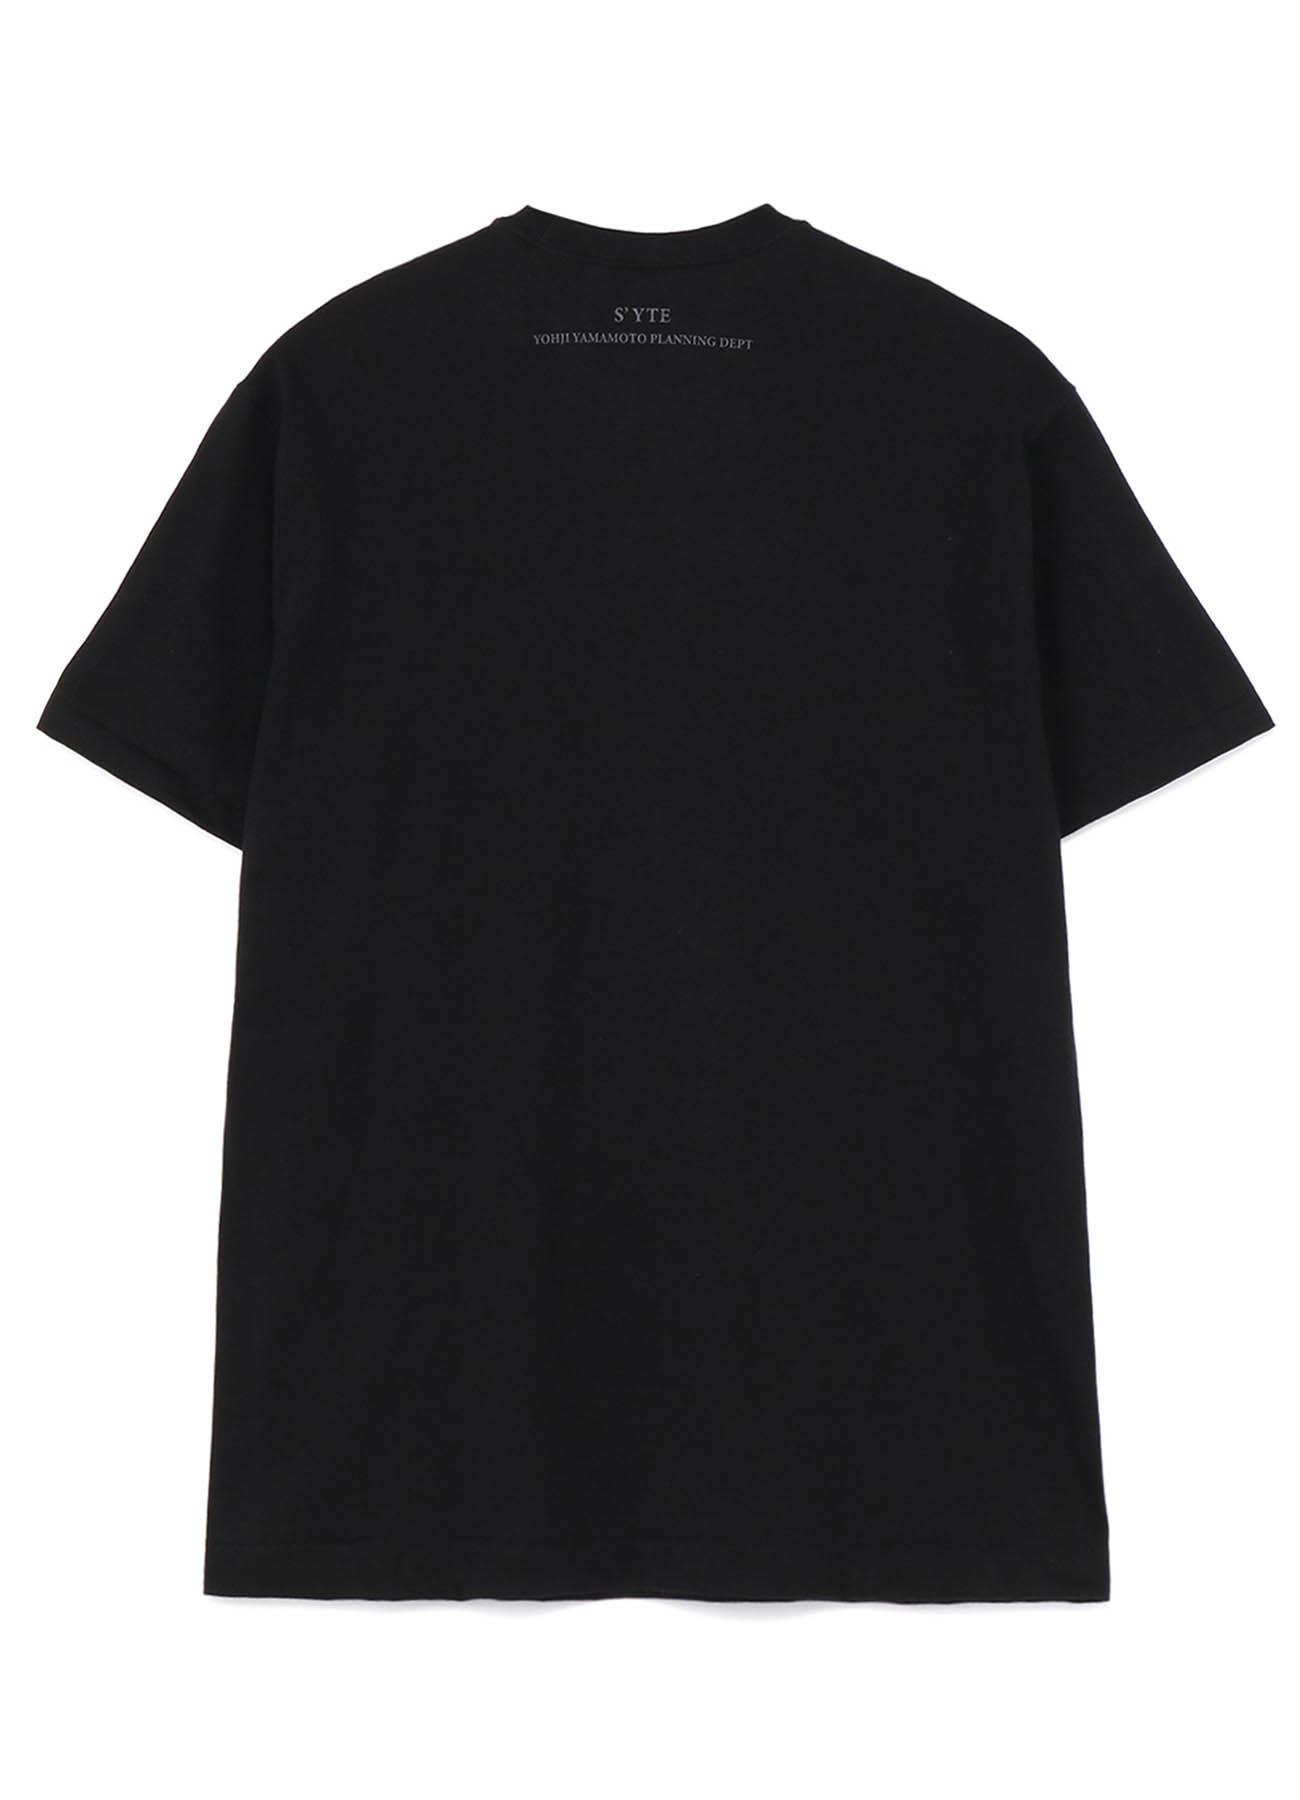 20/Cotton Jersey Strelitzia Bird Of Paradise T-Shirt